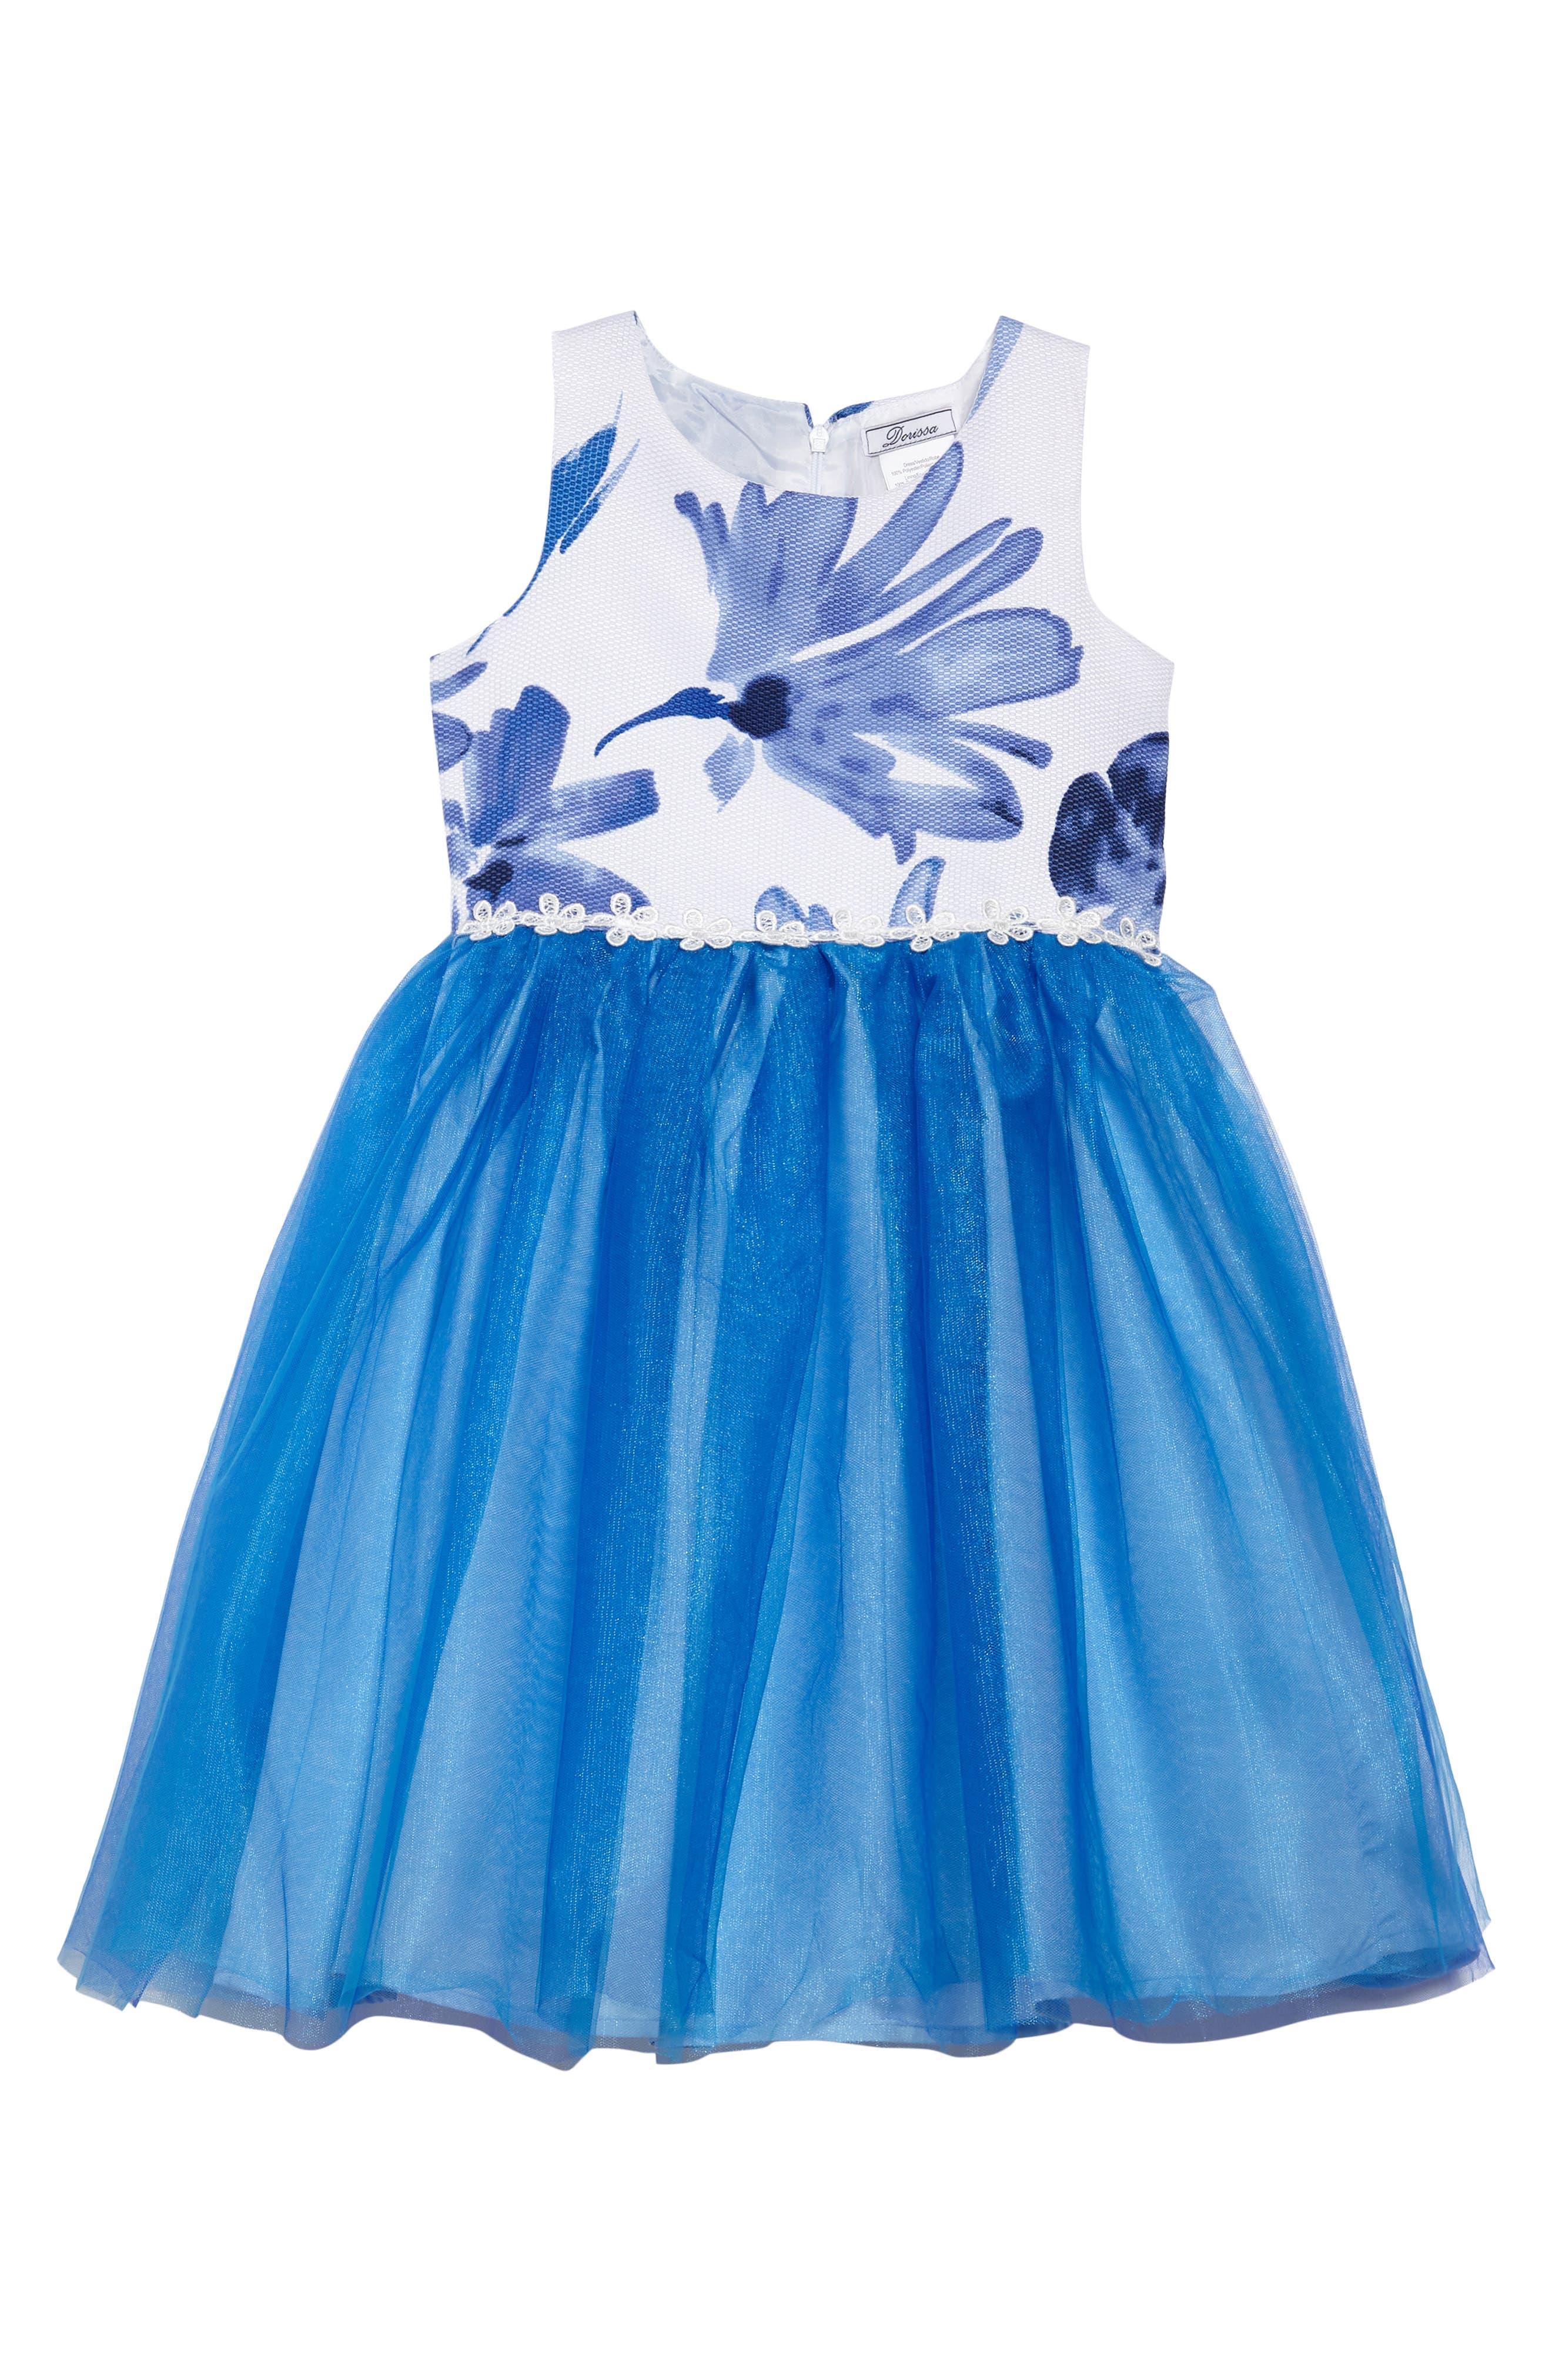 Dorissa Kathy Sleeveless Dress (Toddler Girls, Little Girls & Big Girls)